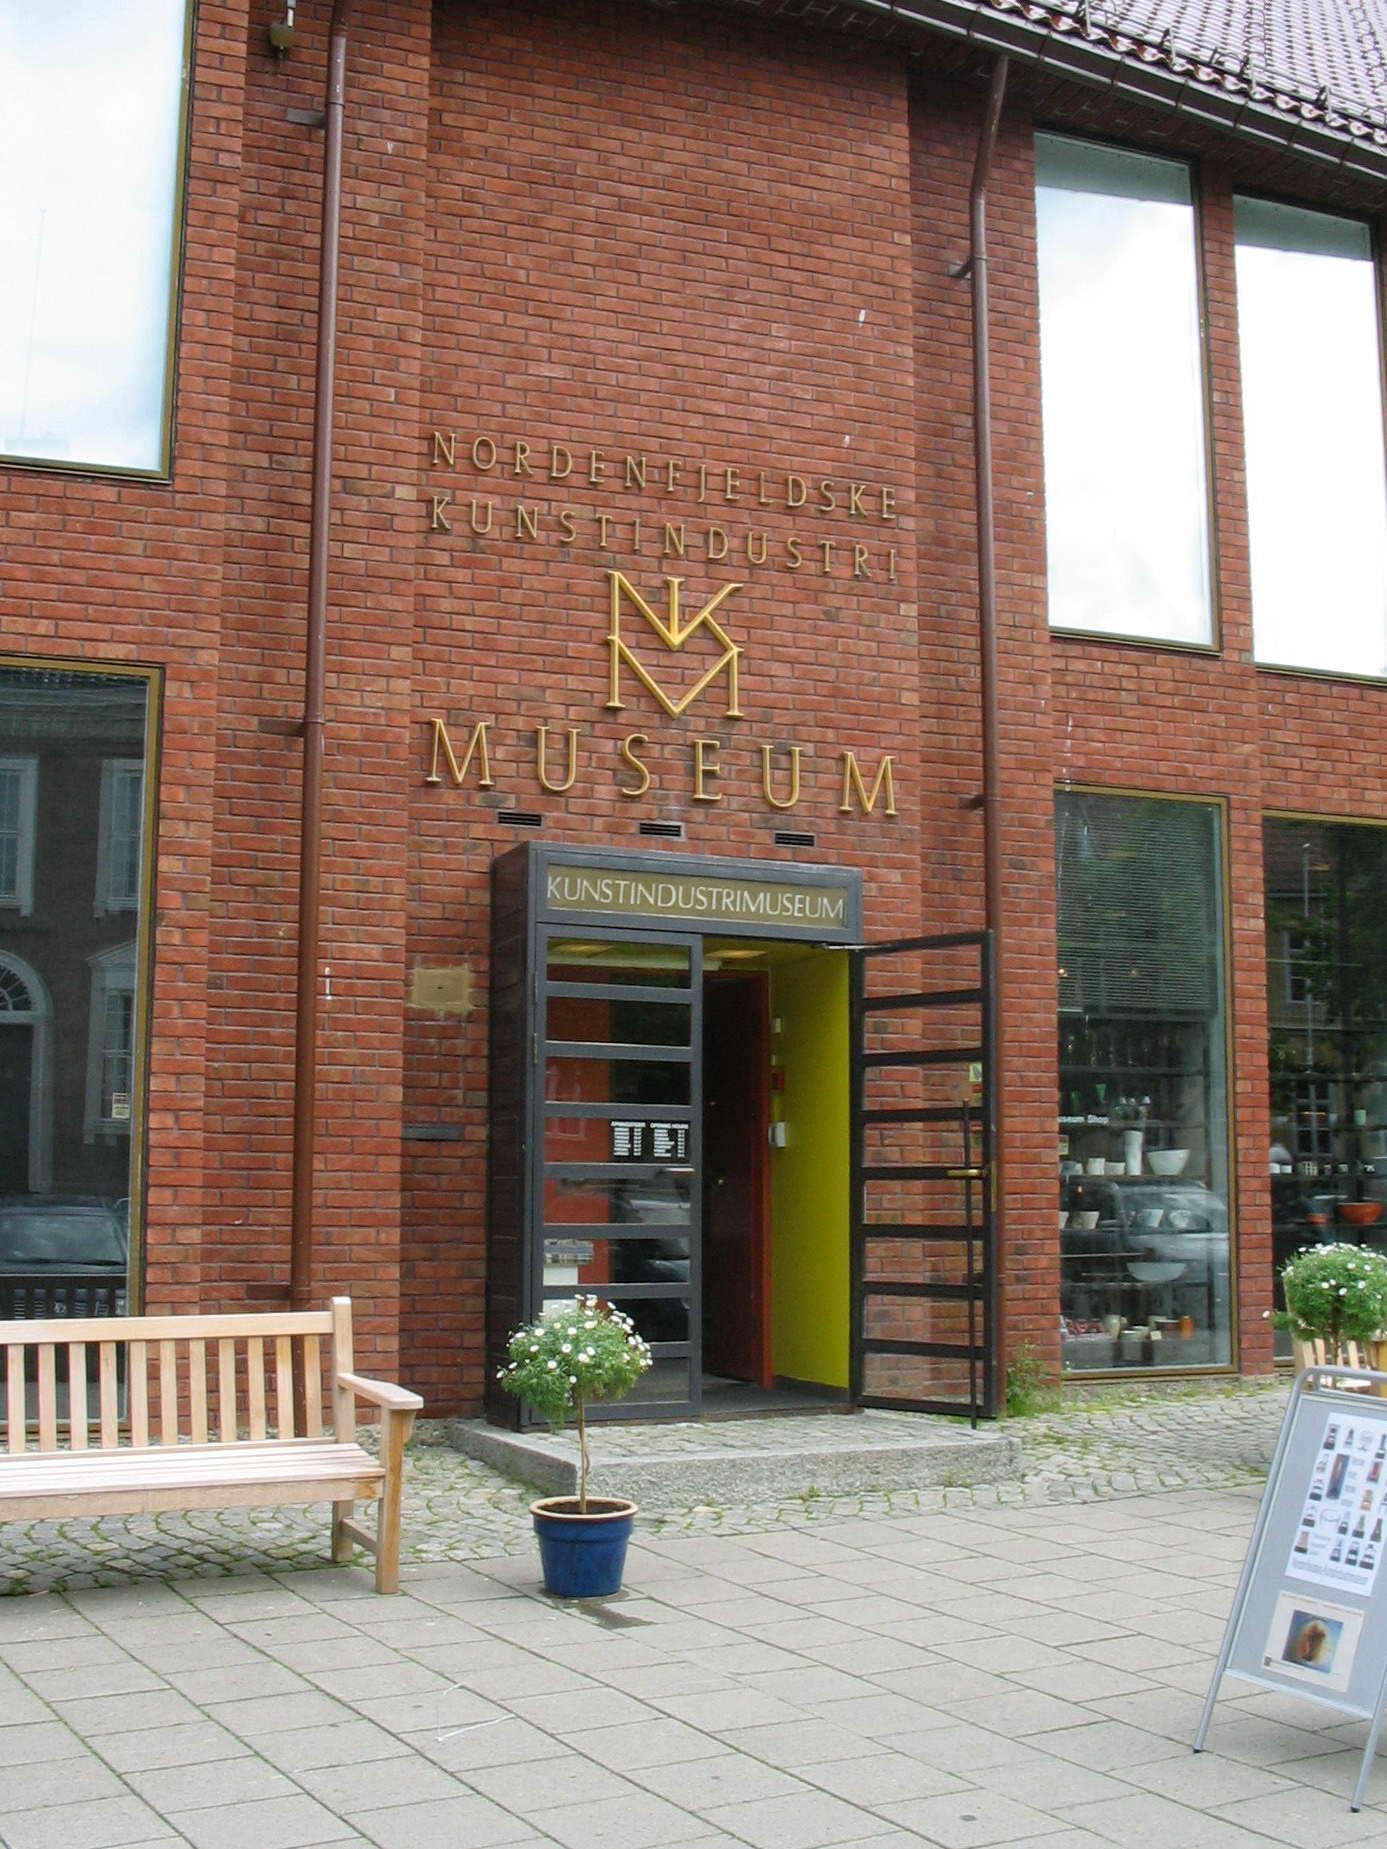 nordenfjeldske kunstindustrimuseum trondheim